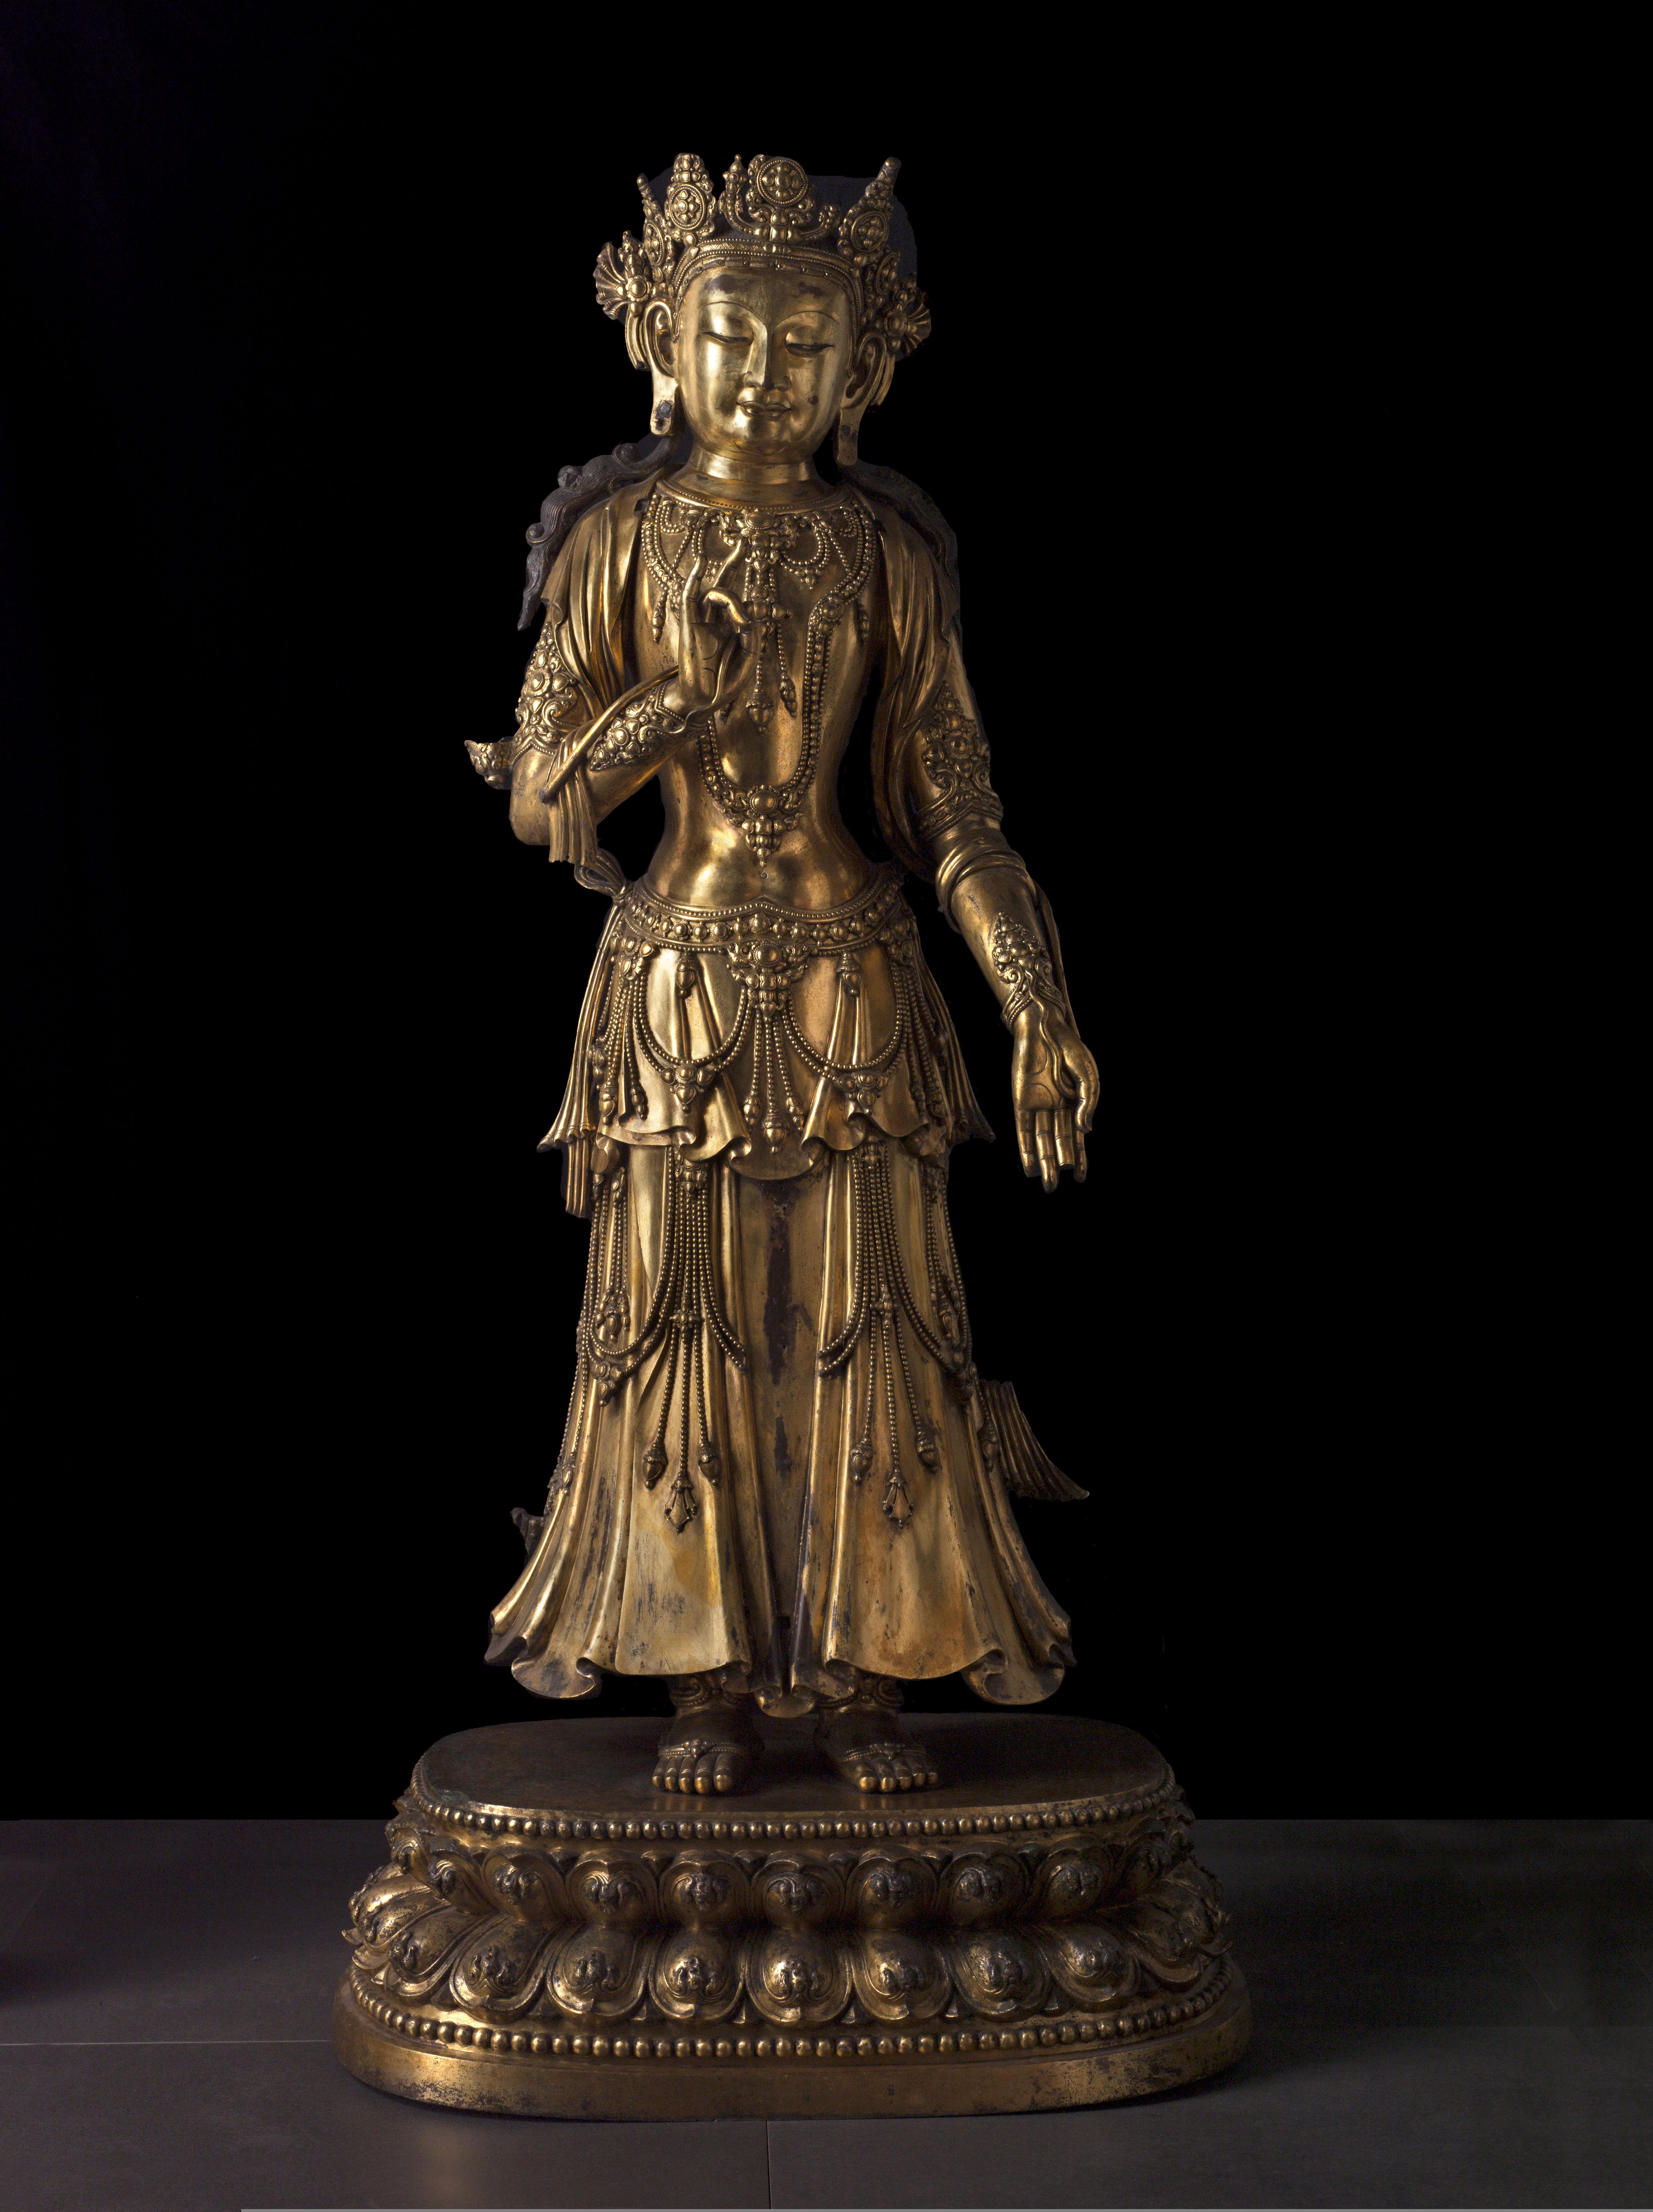 Bodhisattva en bronze doré